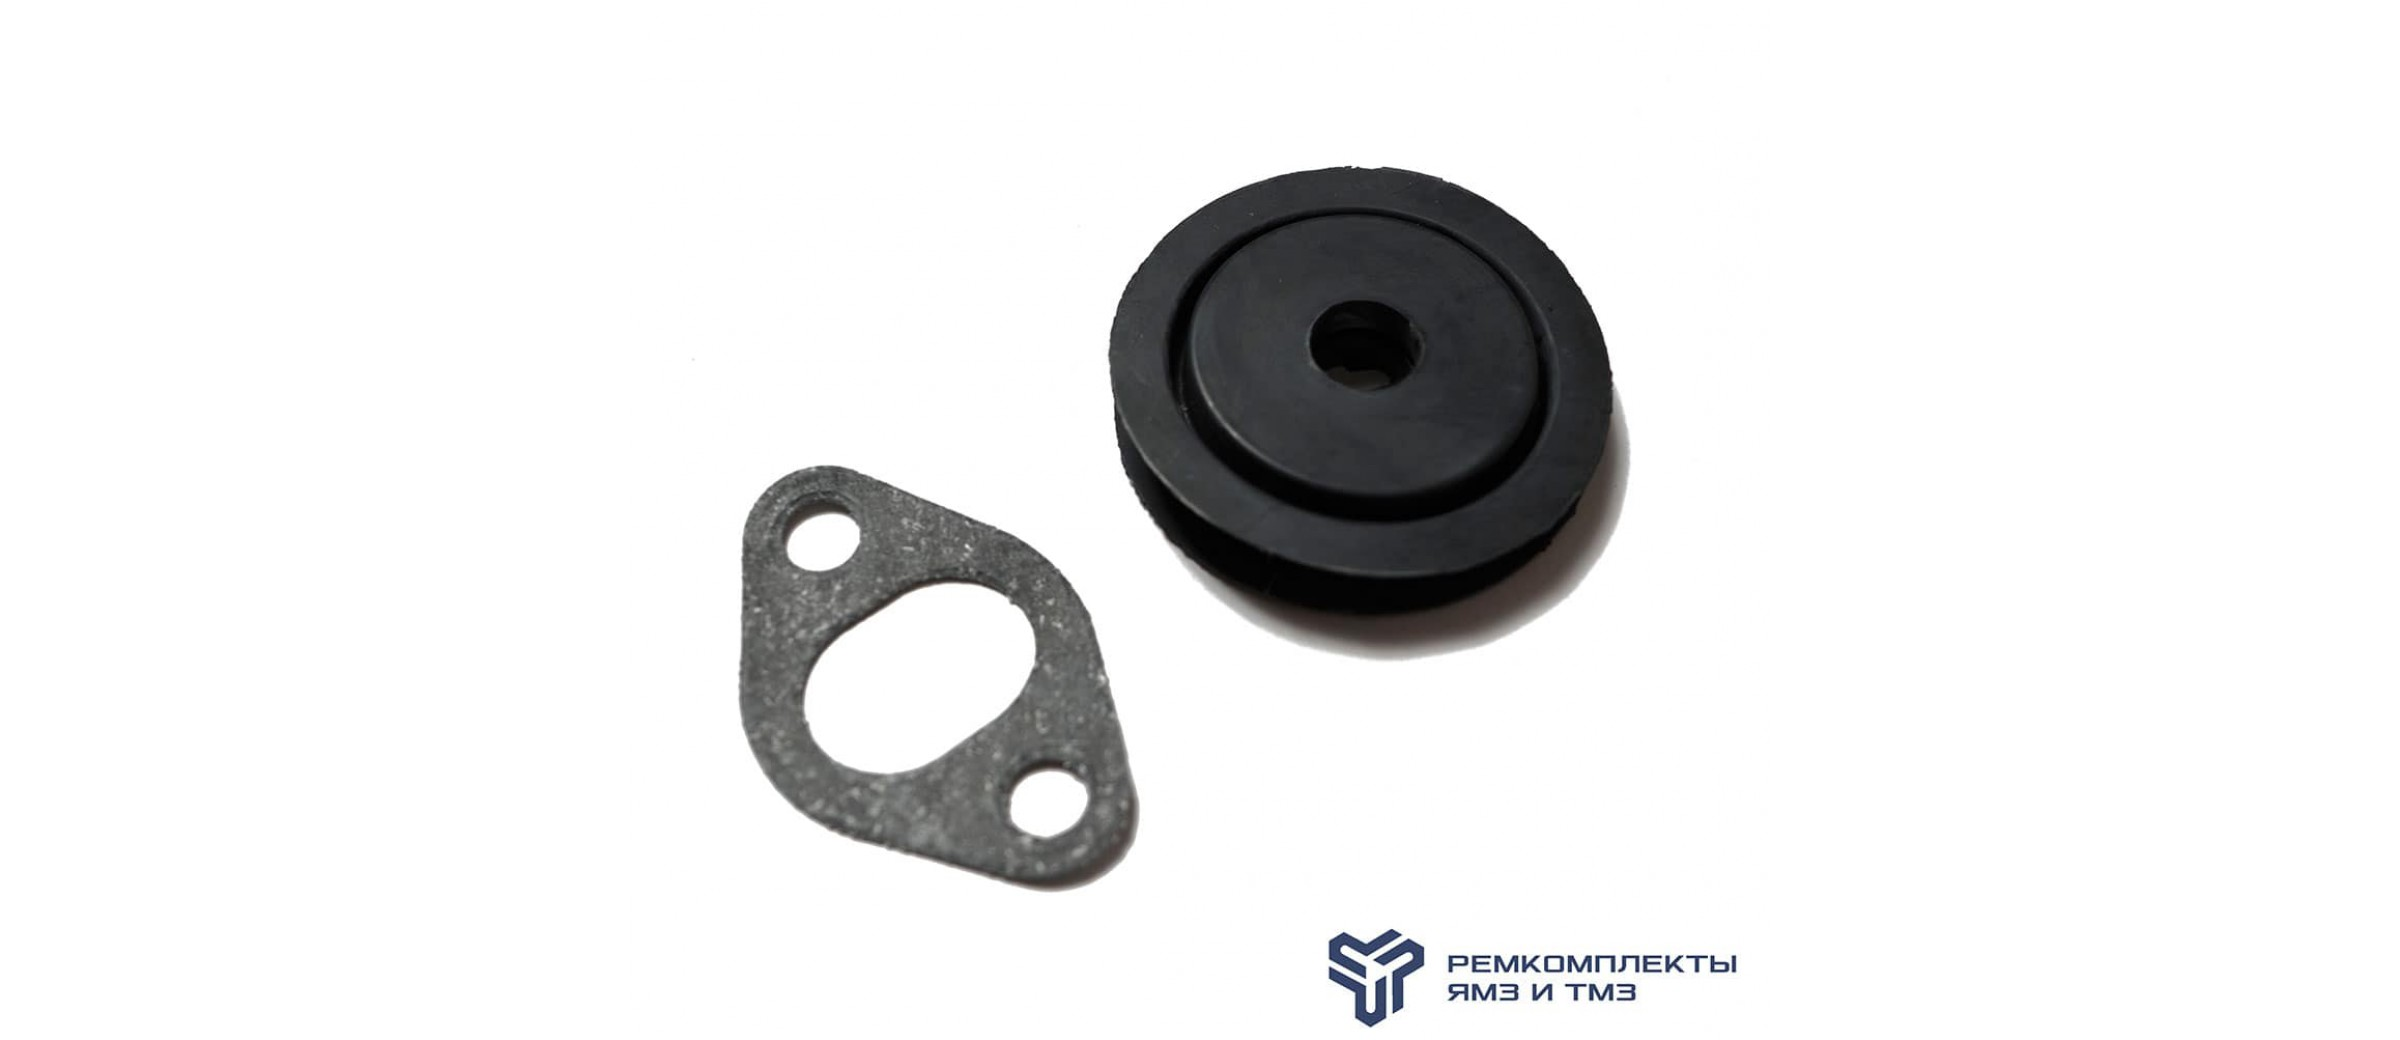 Ремкомплект корректора подачи топлива 901 (диафрагма,прокладка)